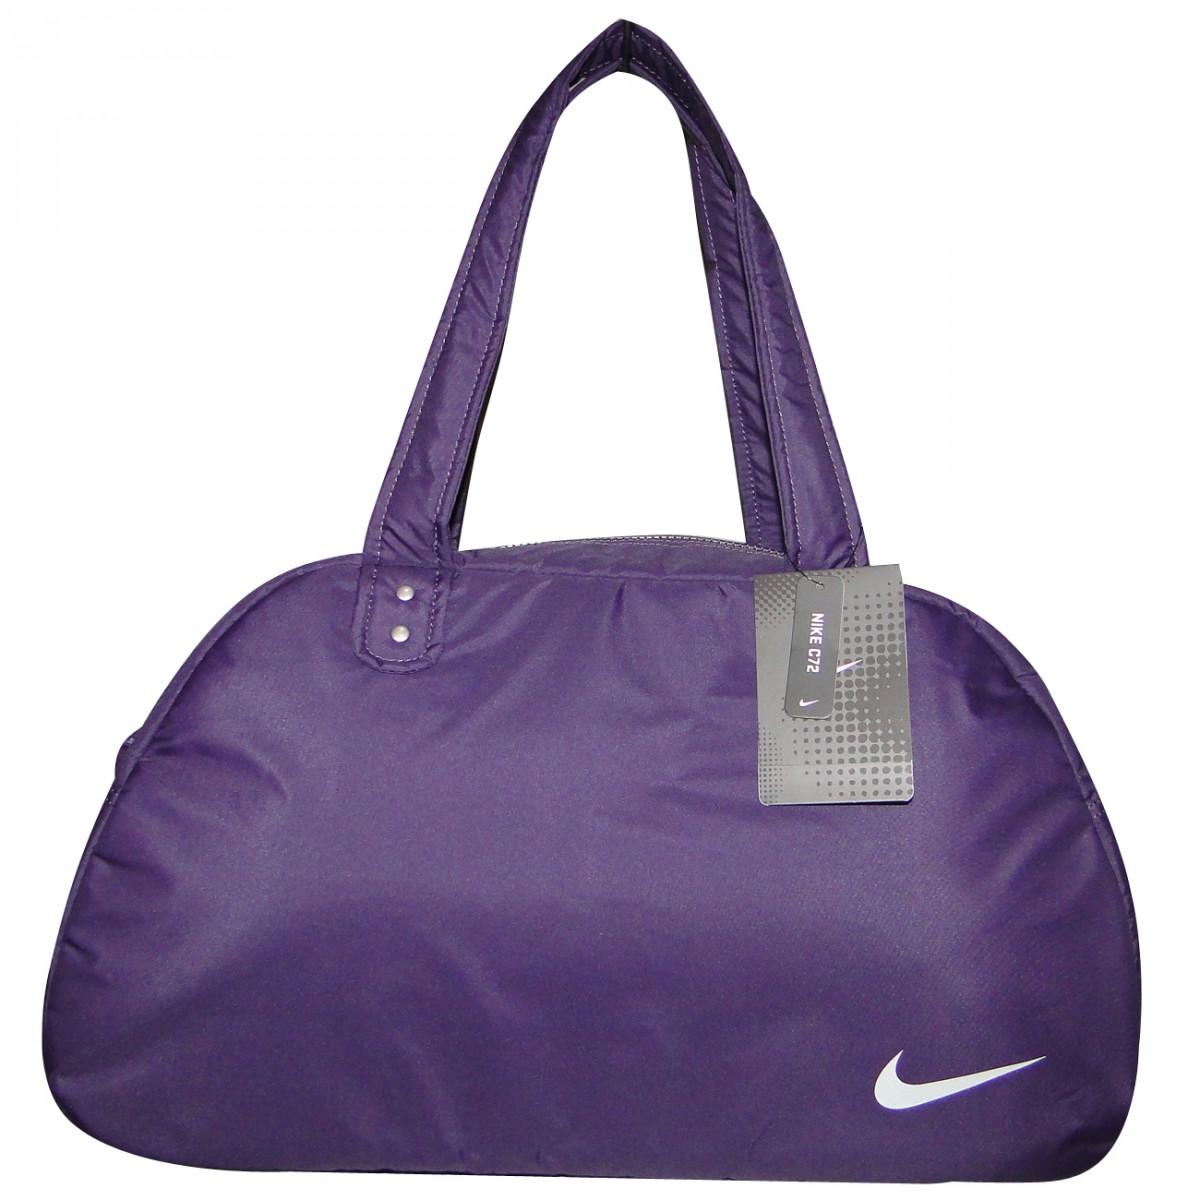 d627855e1 Bolsa Lateral Nike : Pin foto bolsa adidas adicolor holdall on